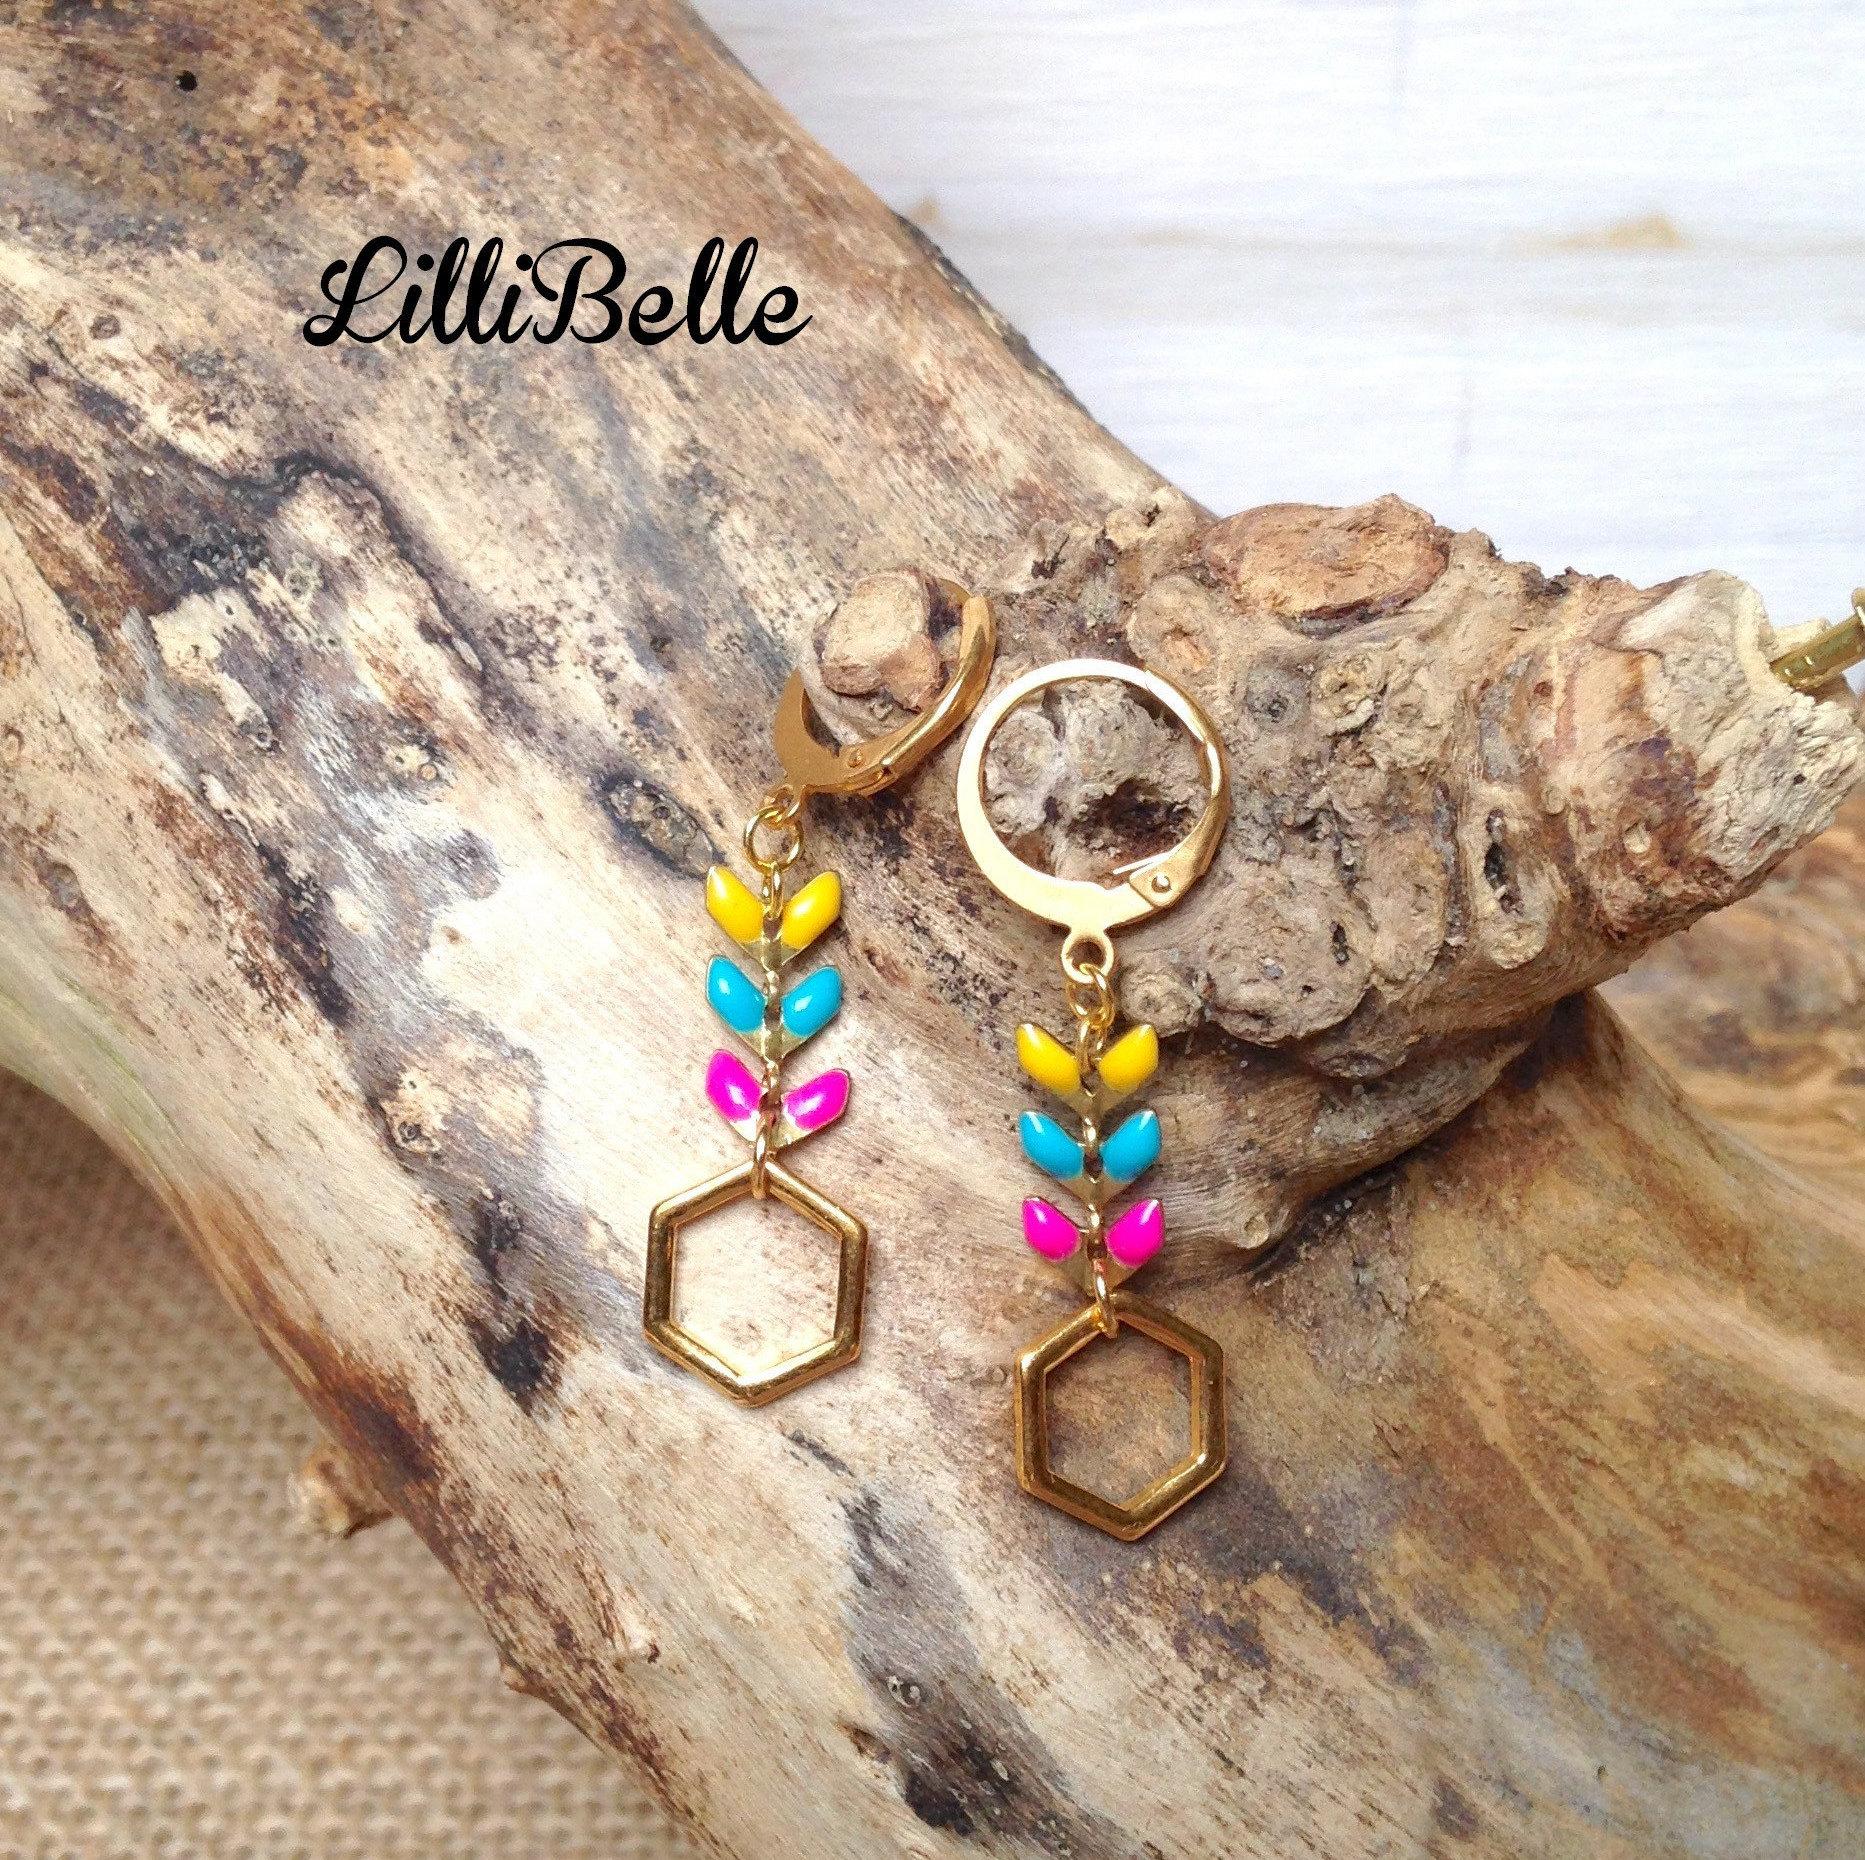 f2b9df70a01eee Gold Earrings, Hexagon and ear chain-jewelry Golden, geometric, minimalist,  handmade